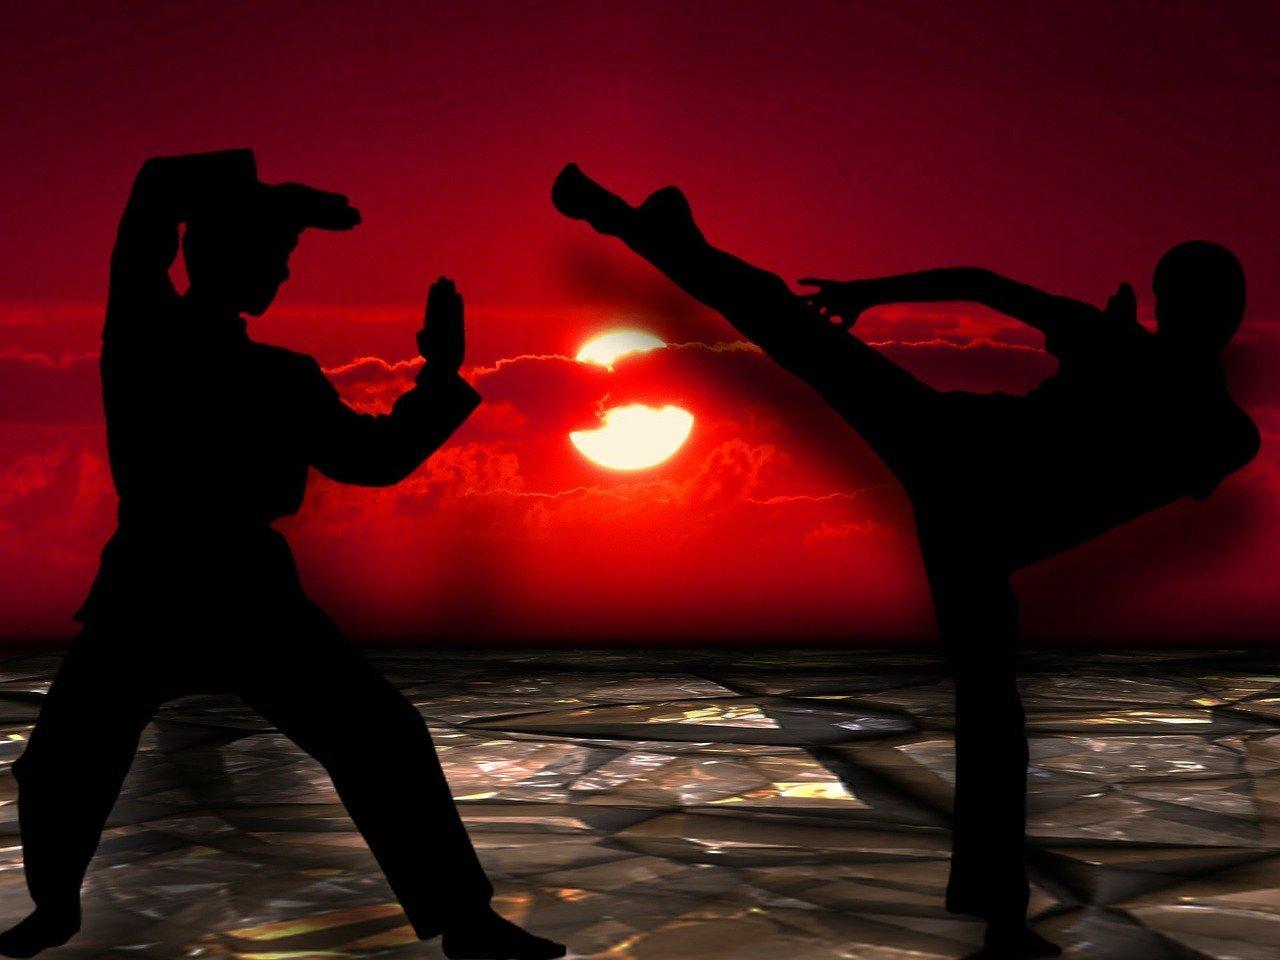 YOUNG-UNG Taekwondo Kampfsport Sportkinesiologie